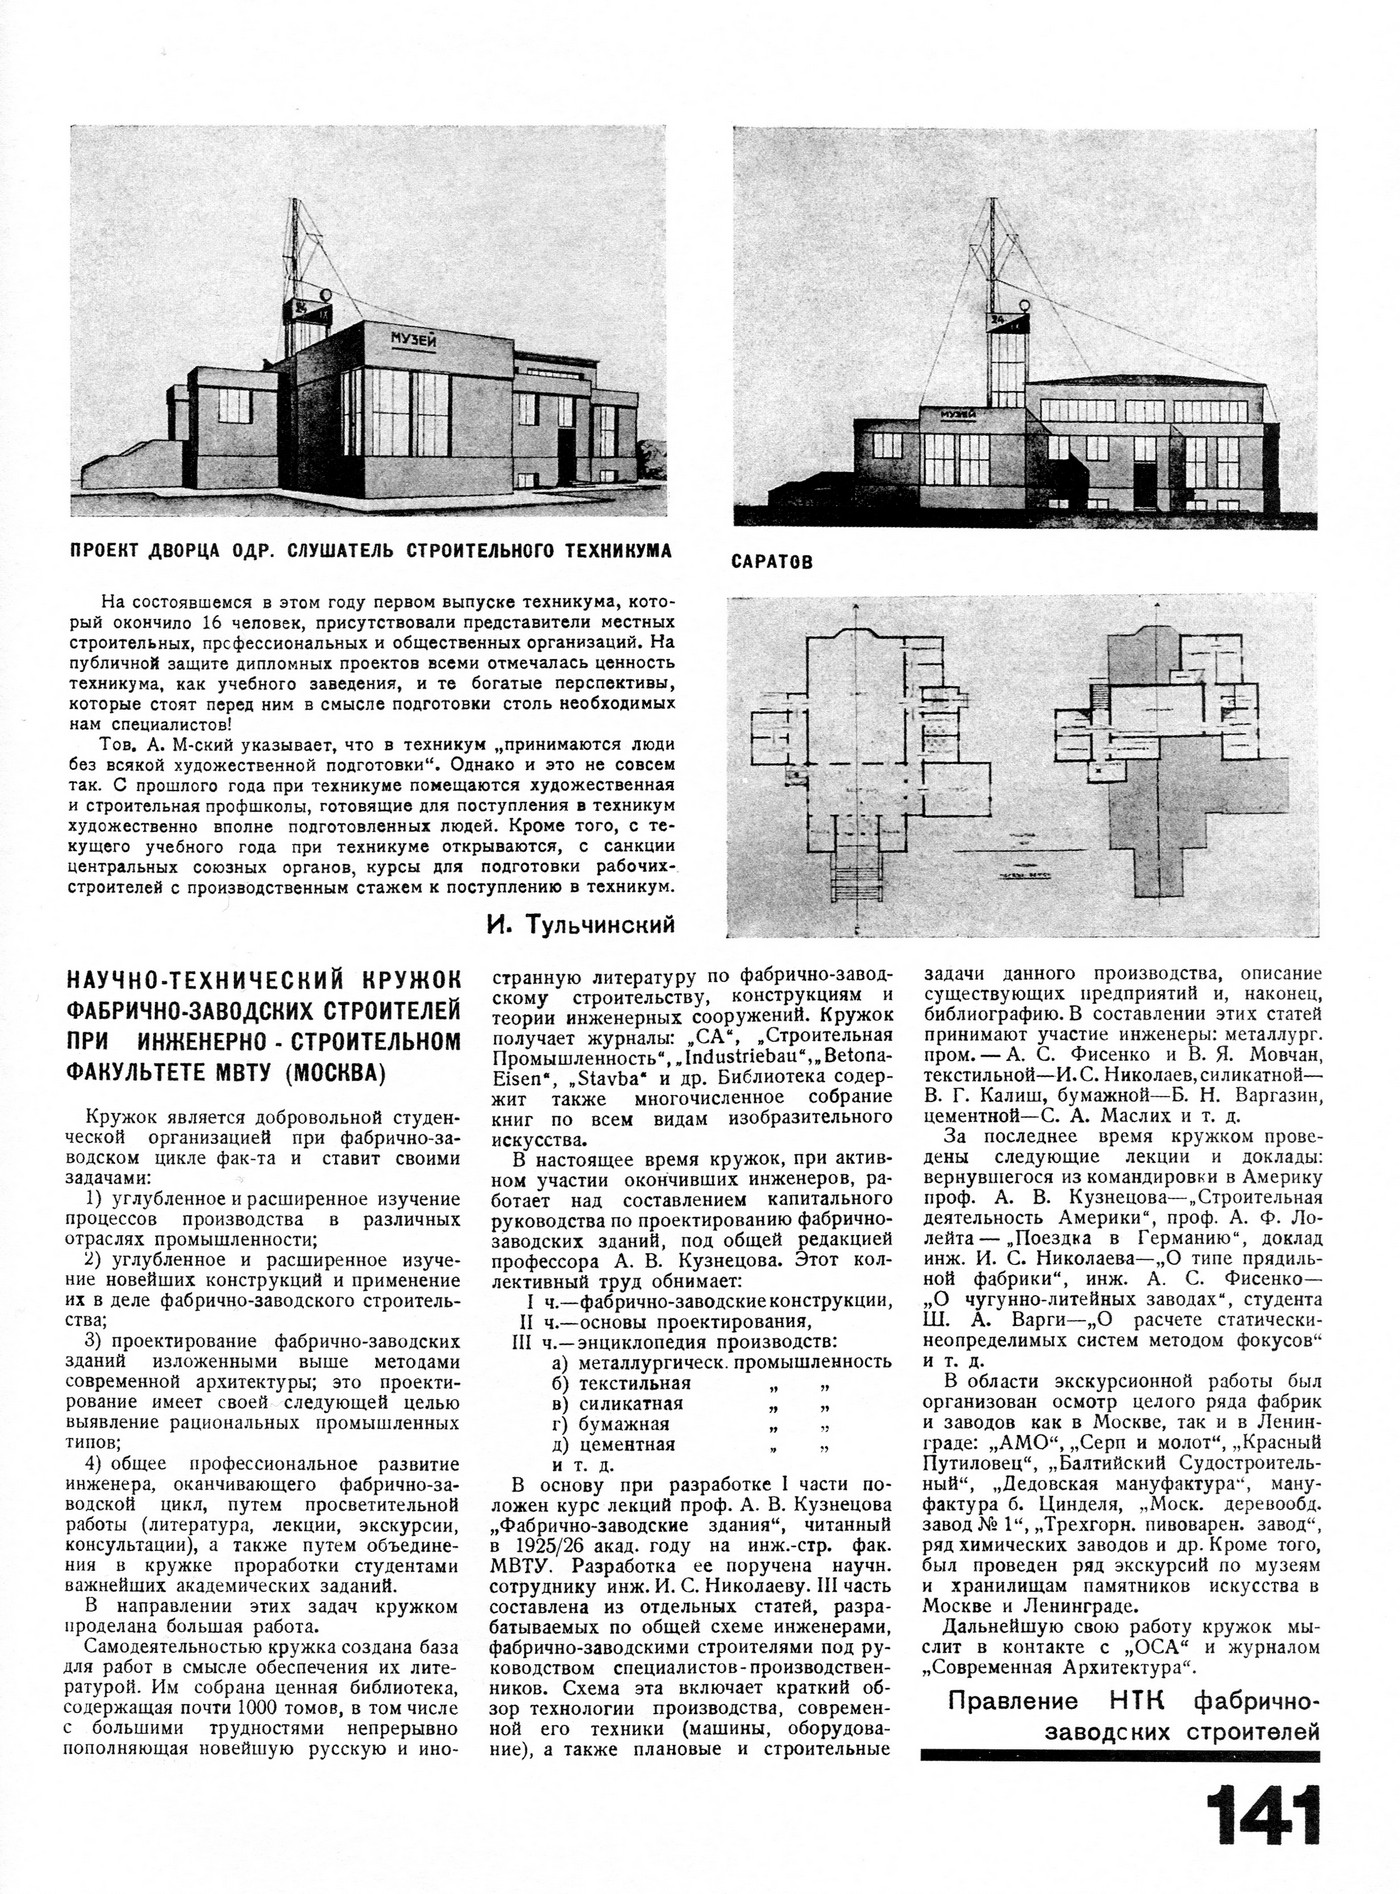 tehne.com-sa-1926-5-6-1400-0033